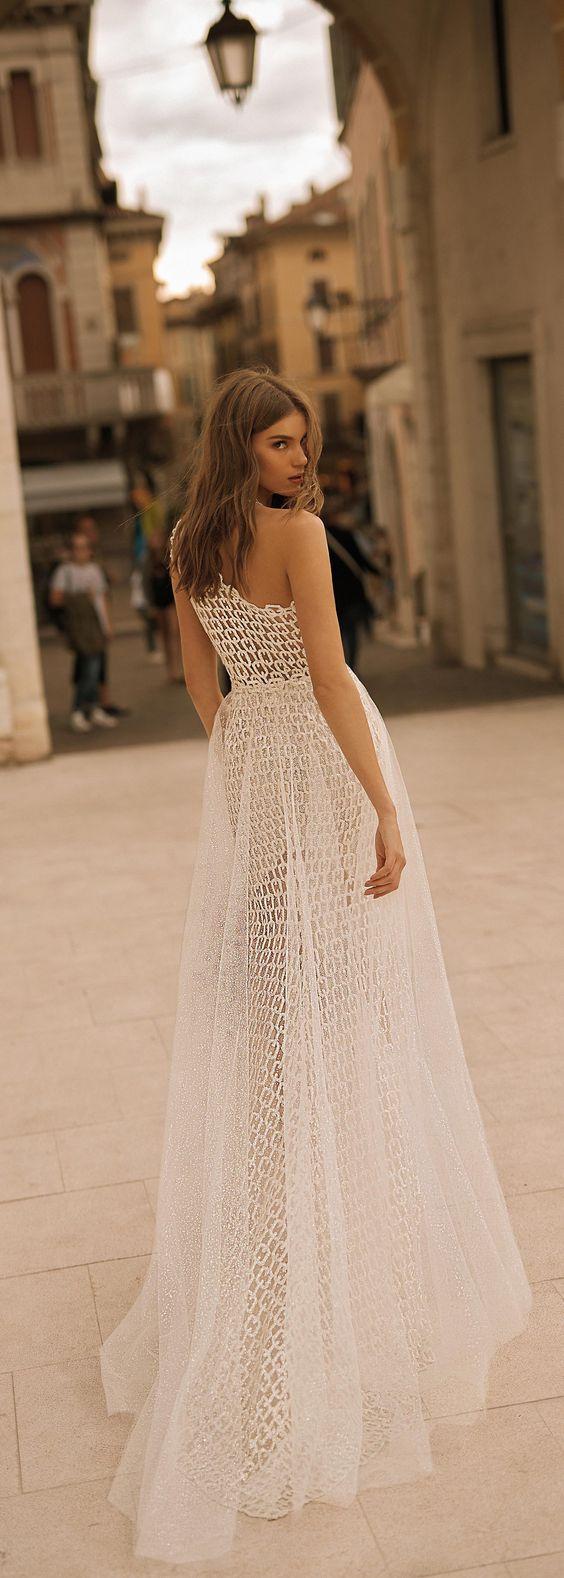 Effortless beautiful wedding dresses